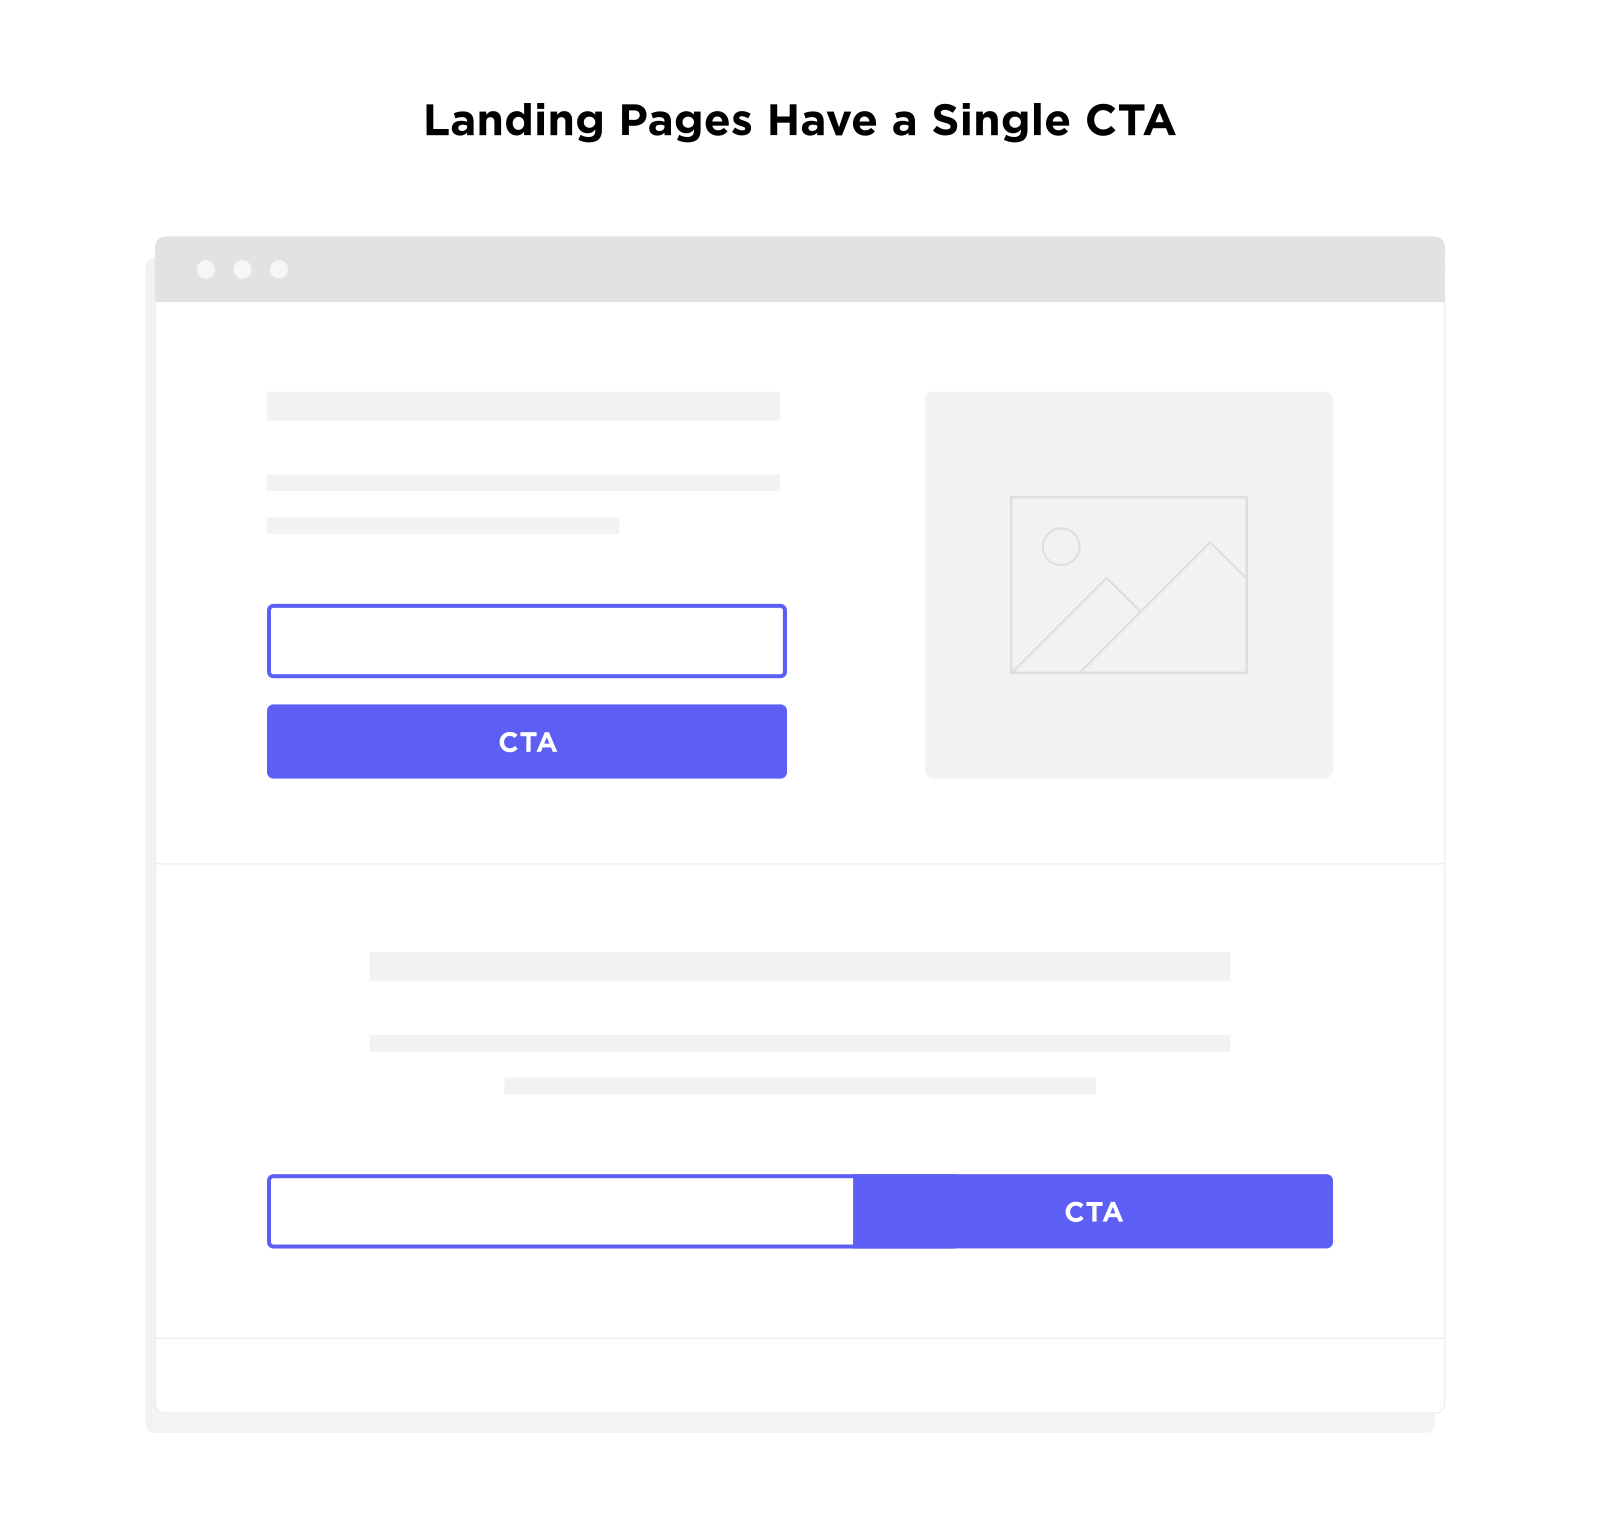 Landing Pages Have A Single CTA